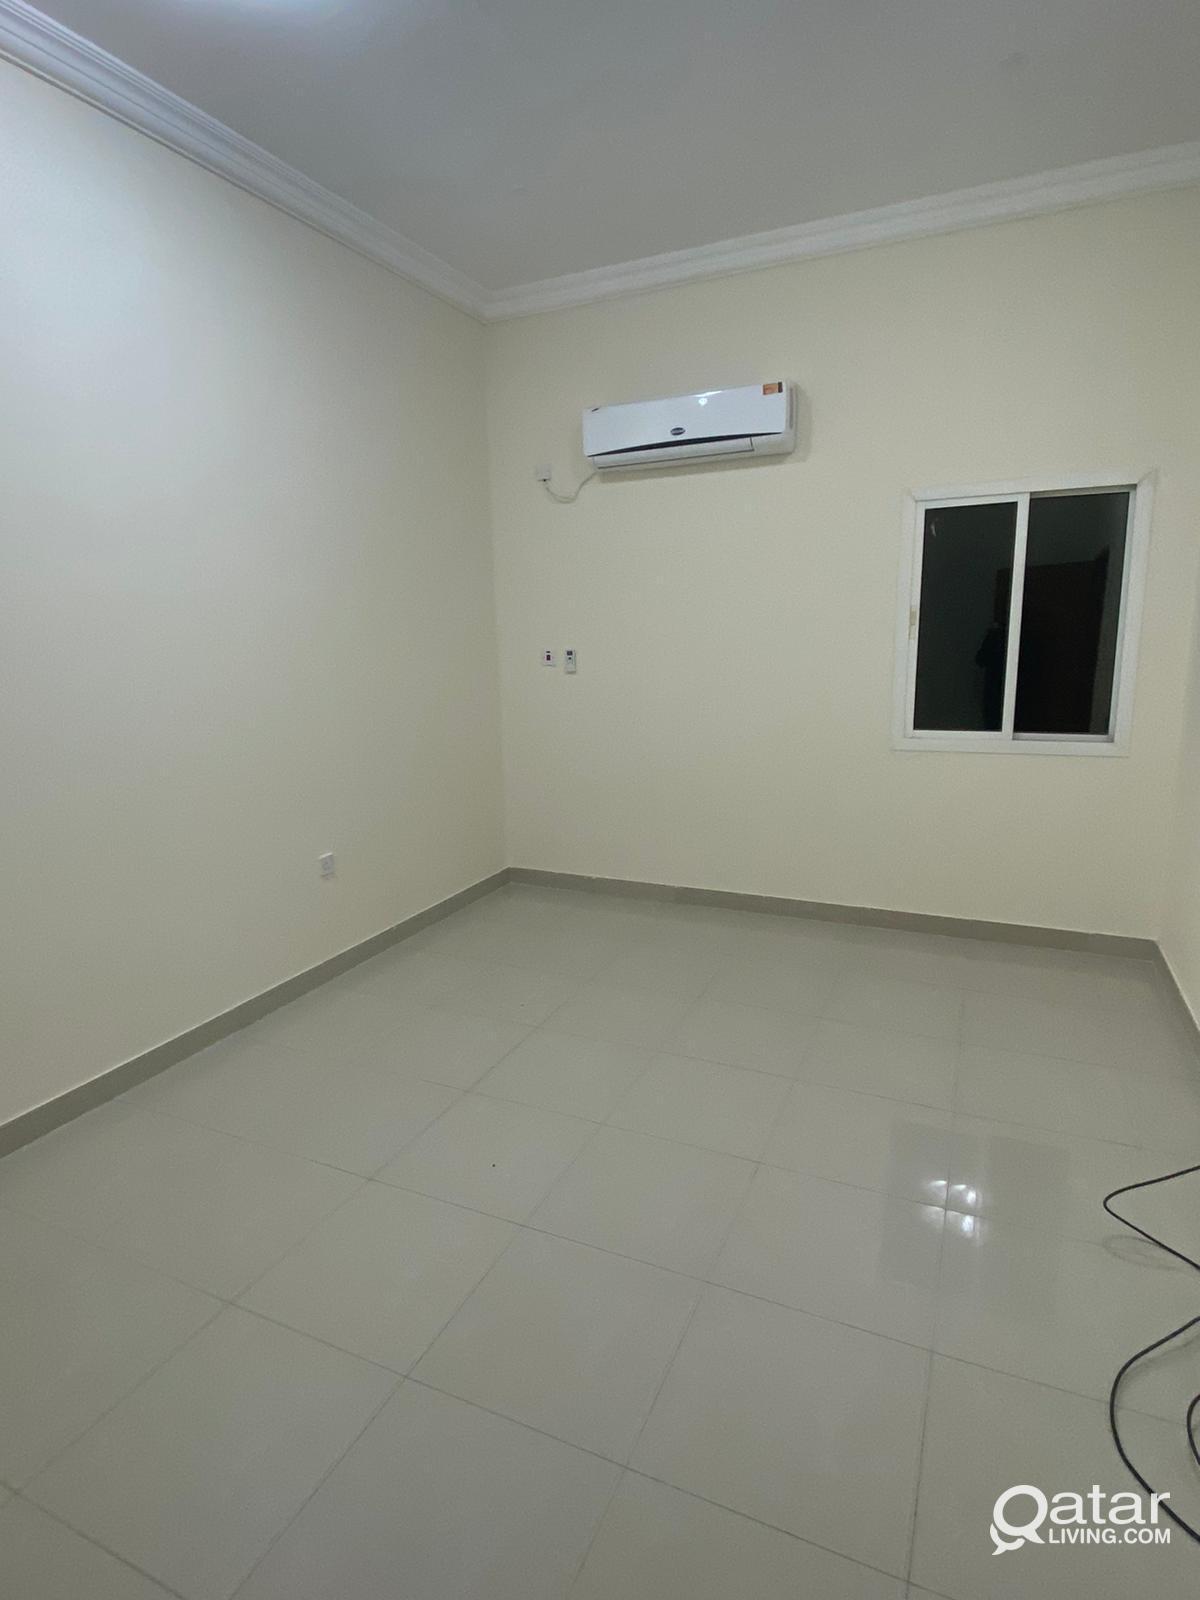 3 BHK apartment near LULU hypermarket in Old Airpo